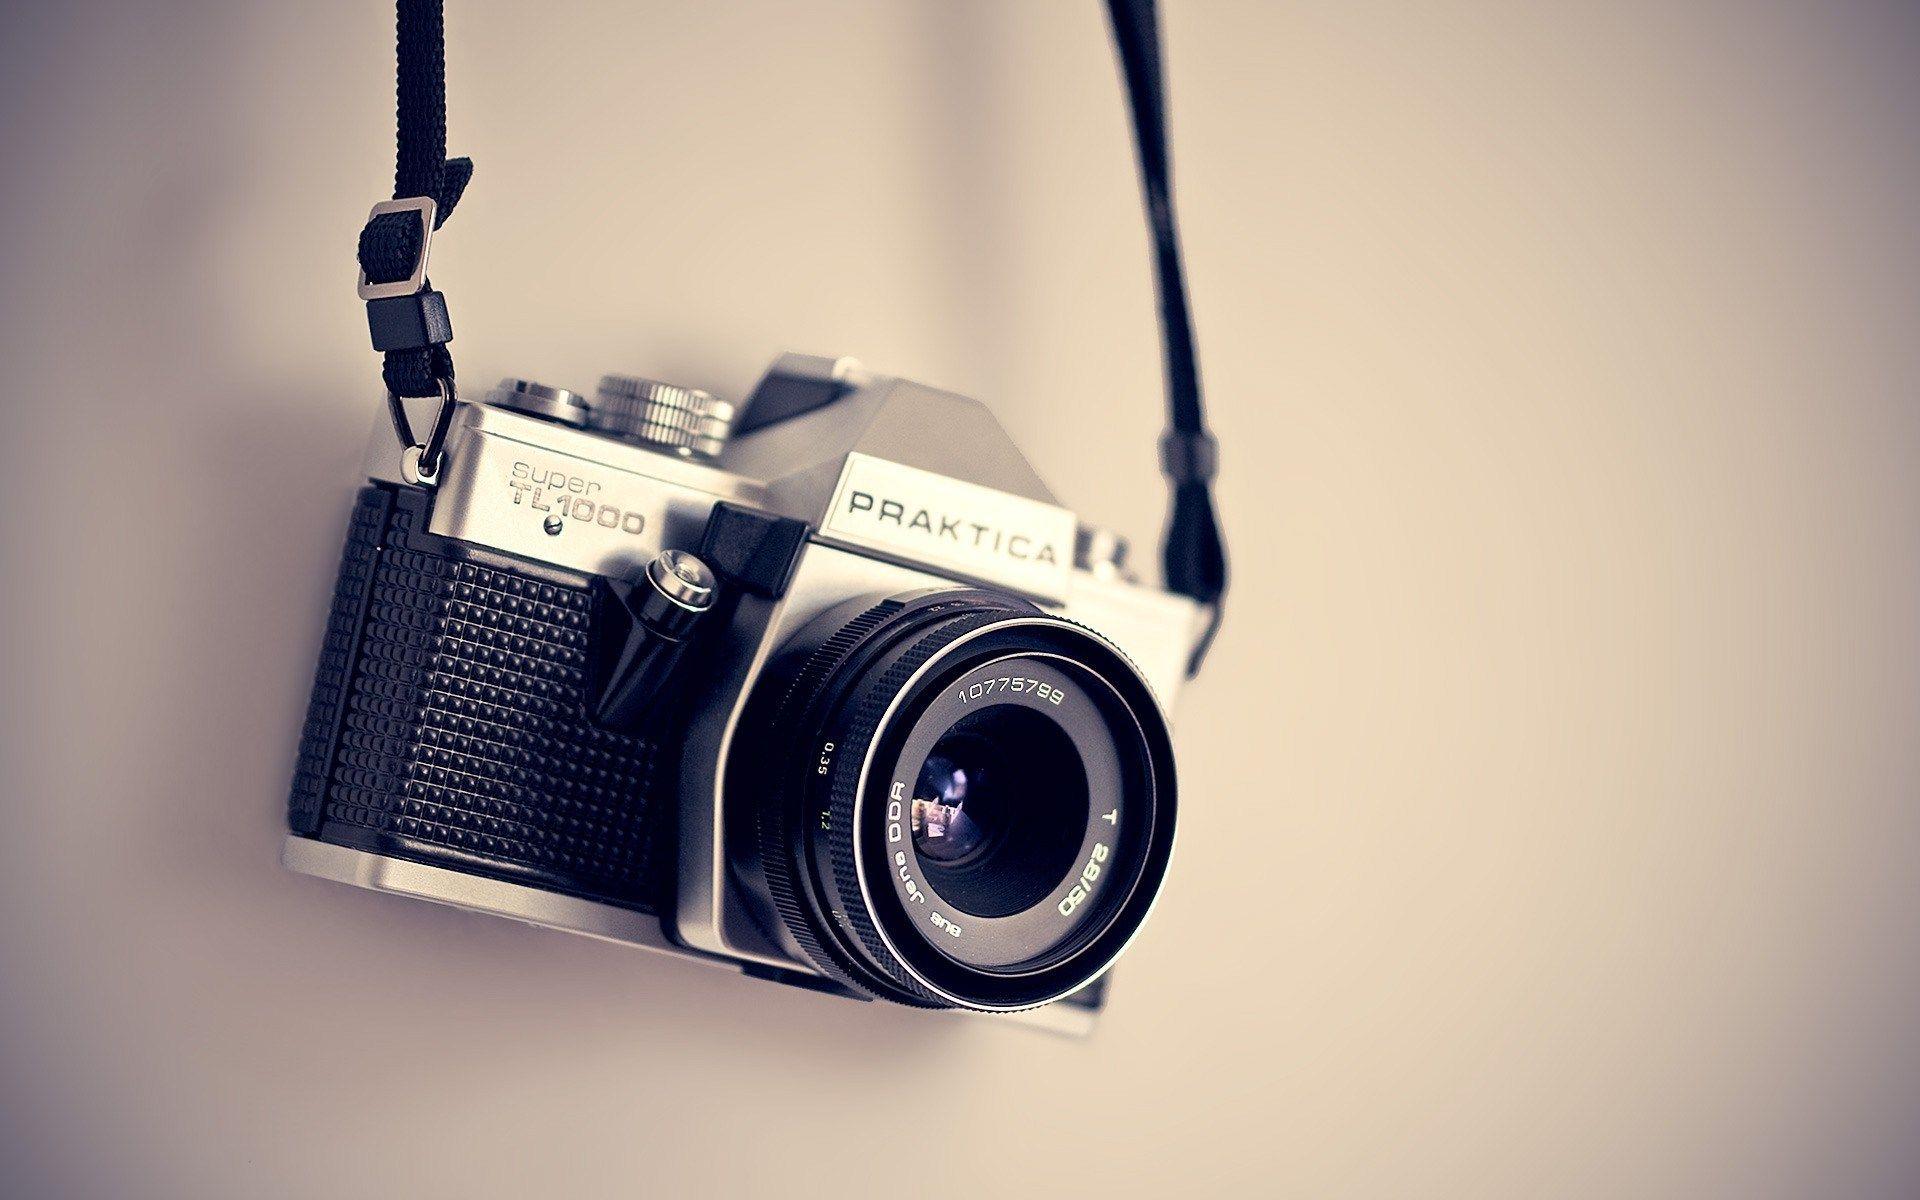 Hd wallpaper camera - Find This Pin And More On Cameras Macro Old Camera Praktica Photo Hd Wallpaper